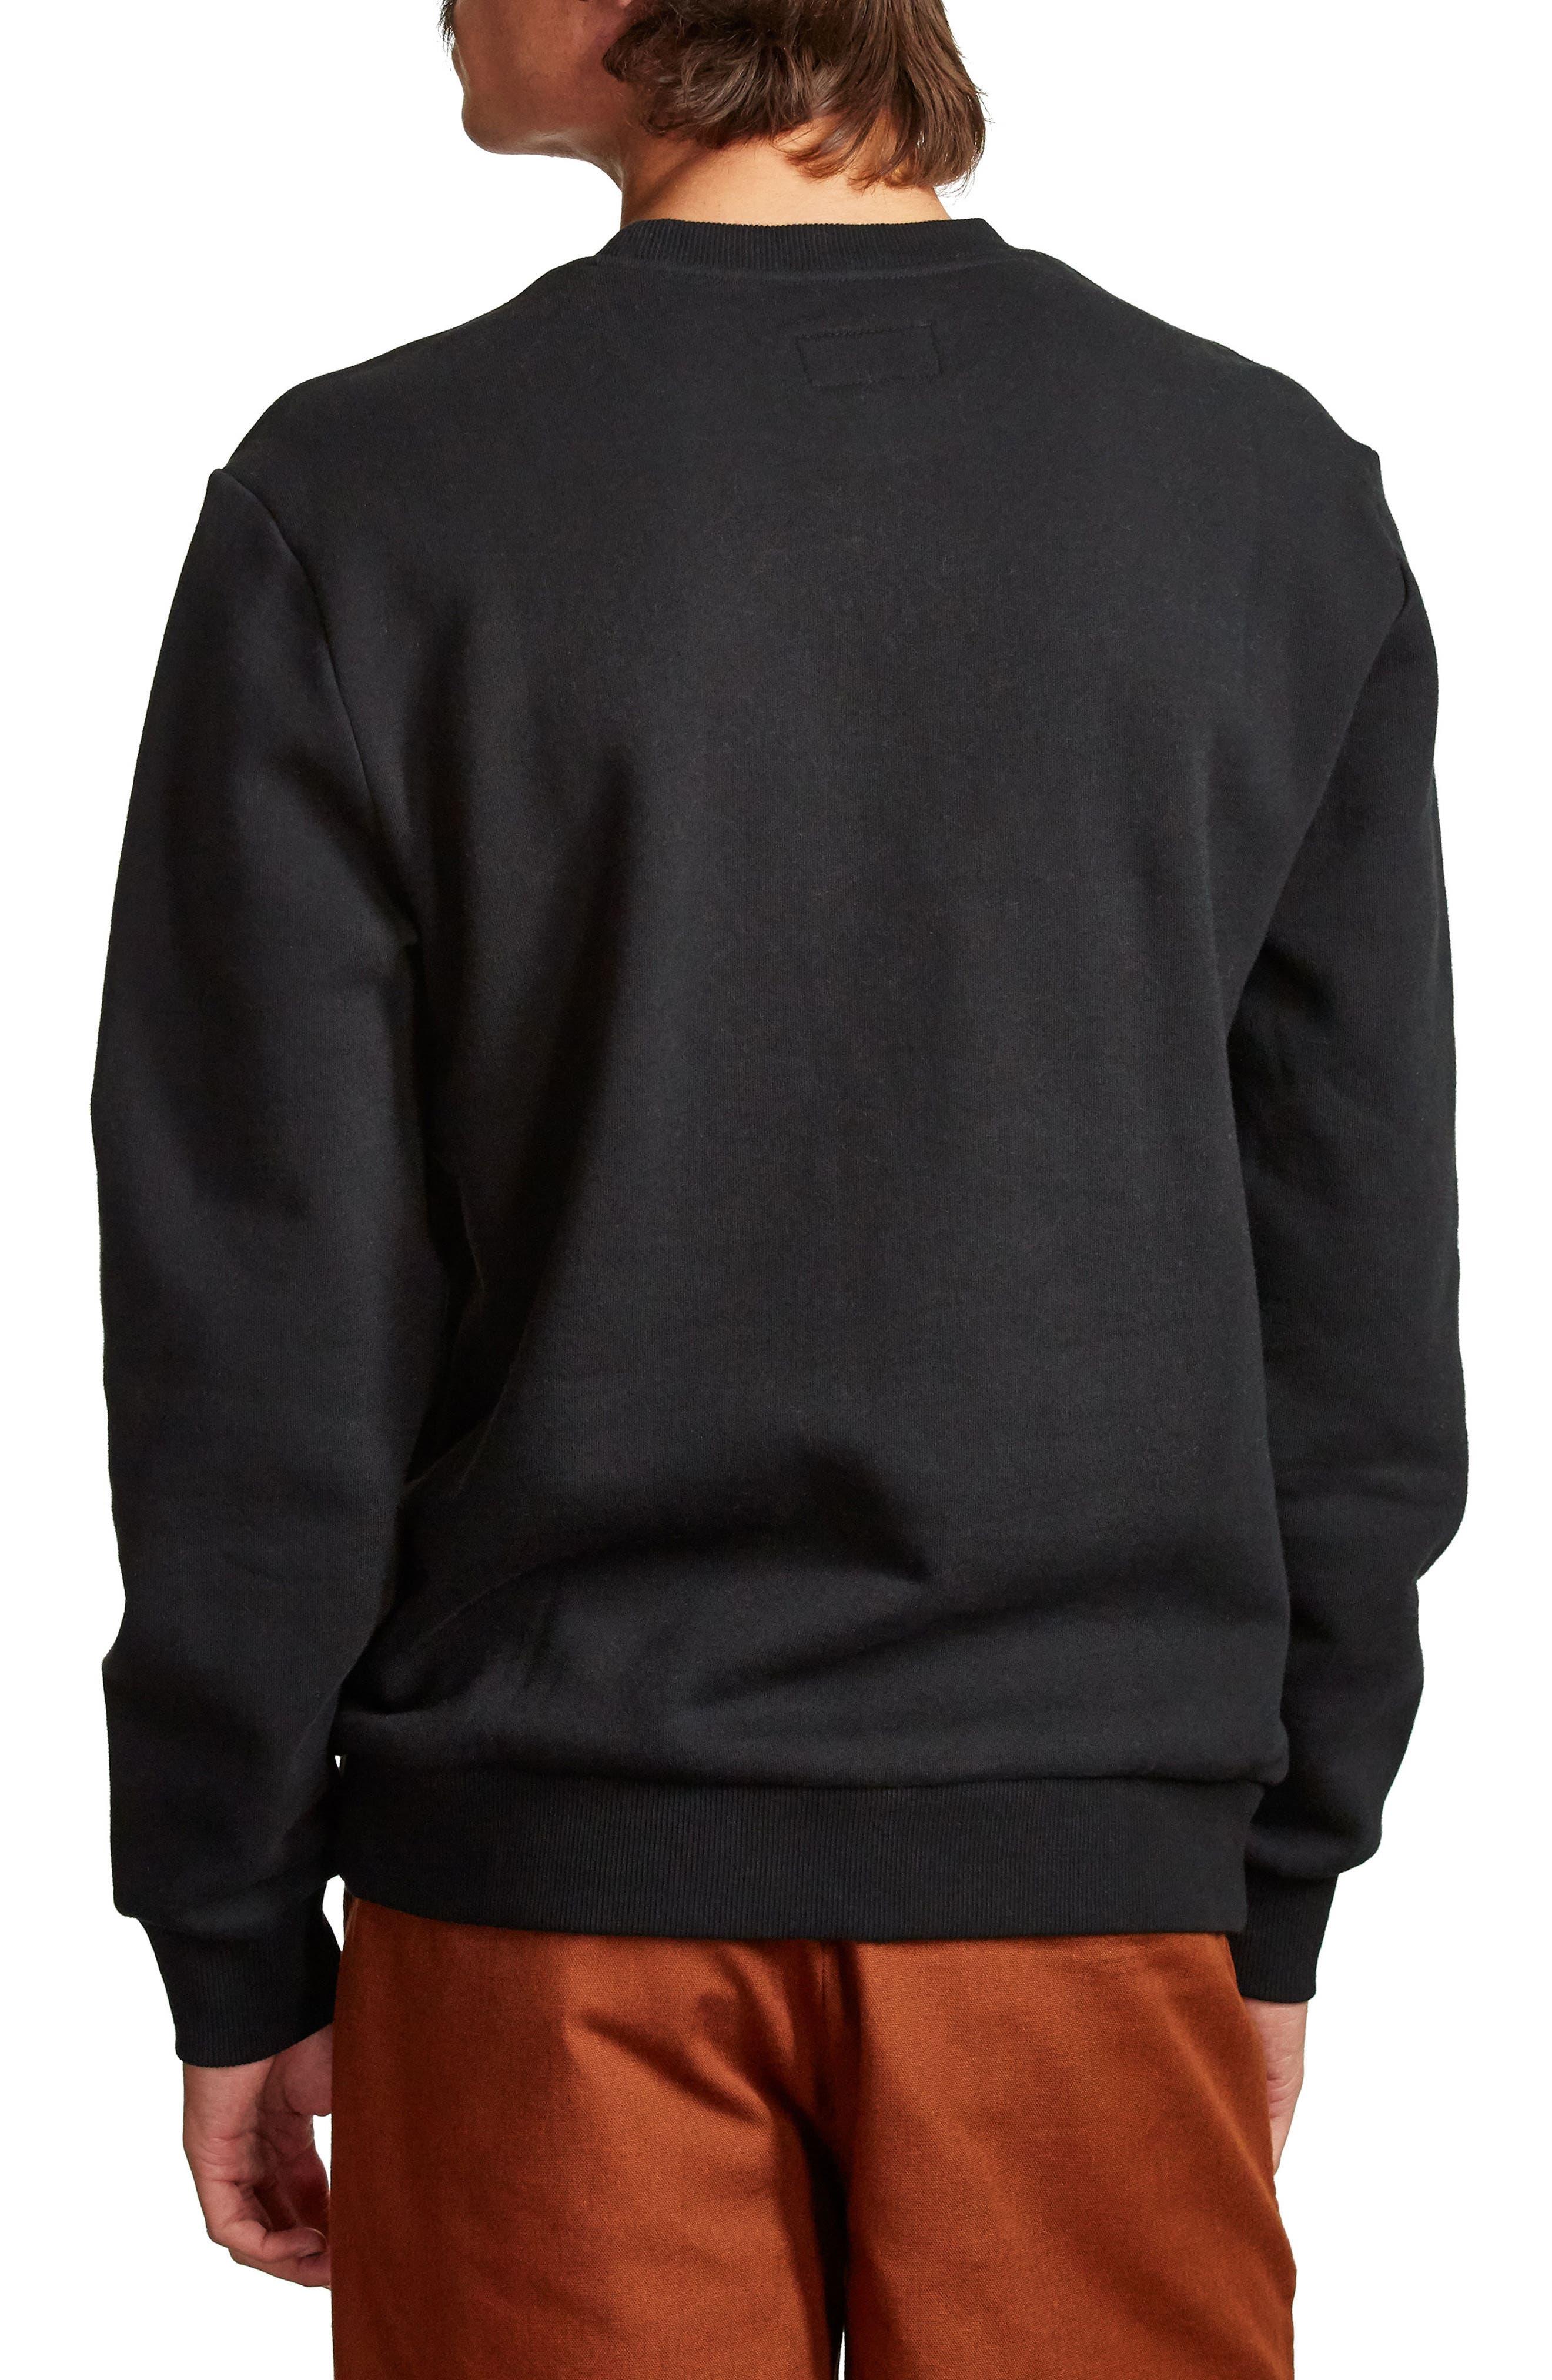 Stonewell Sweatshirt,                             Alternate thumbnail 2, color,                             001